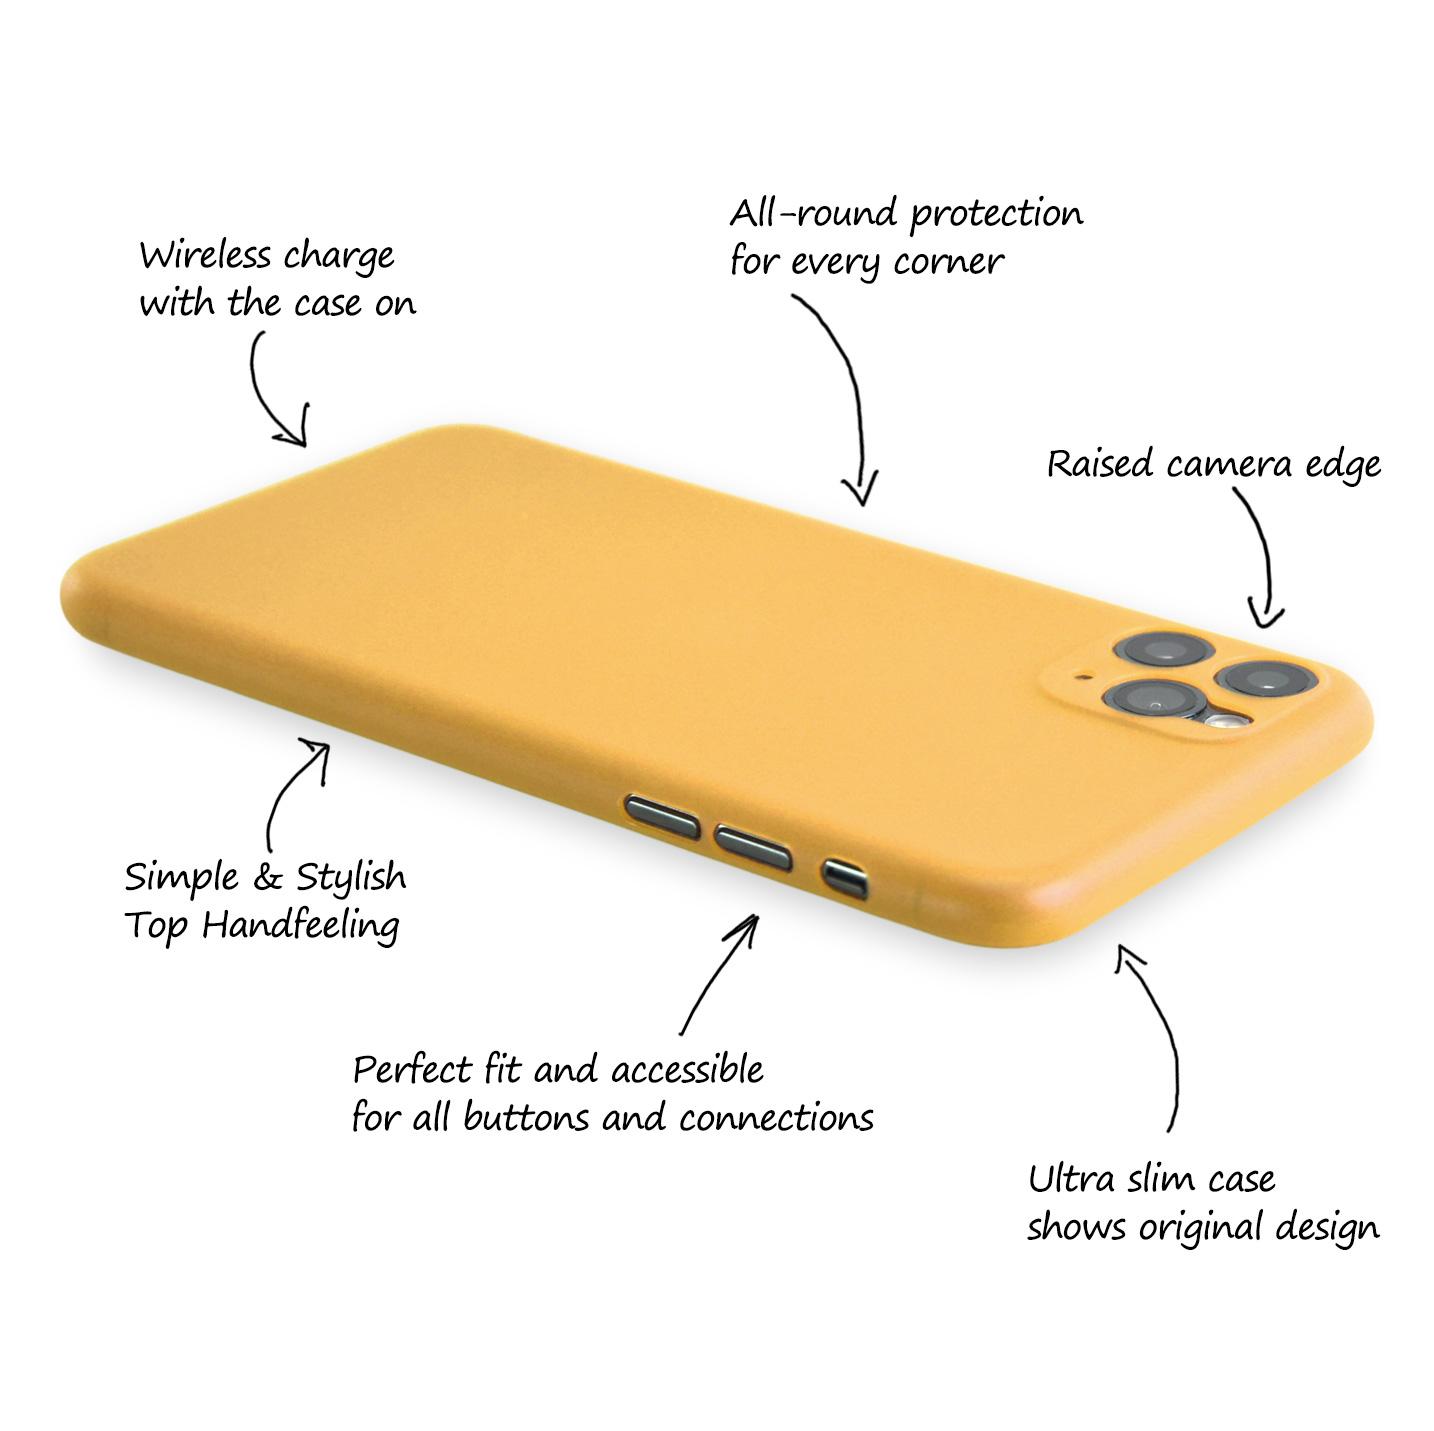 Ultra-Slim-Case-iPhone-11-Pro-5-8-034-Matt-Clear-Schutz-Huelle-Skin-Cover-Etui-Folie Indexbild 42